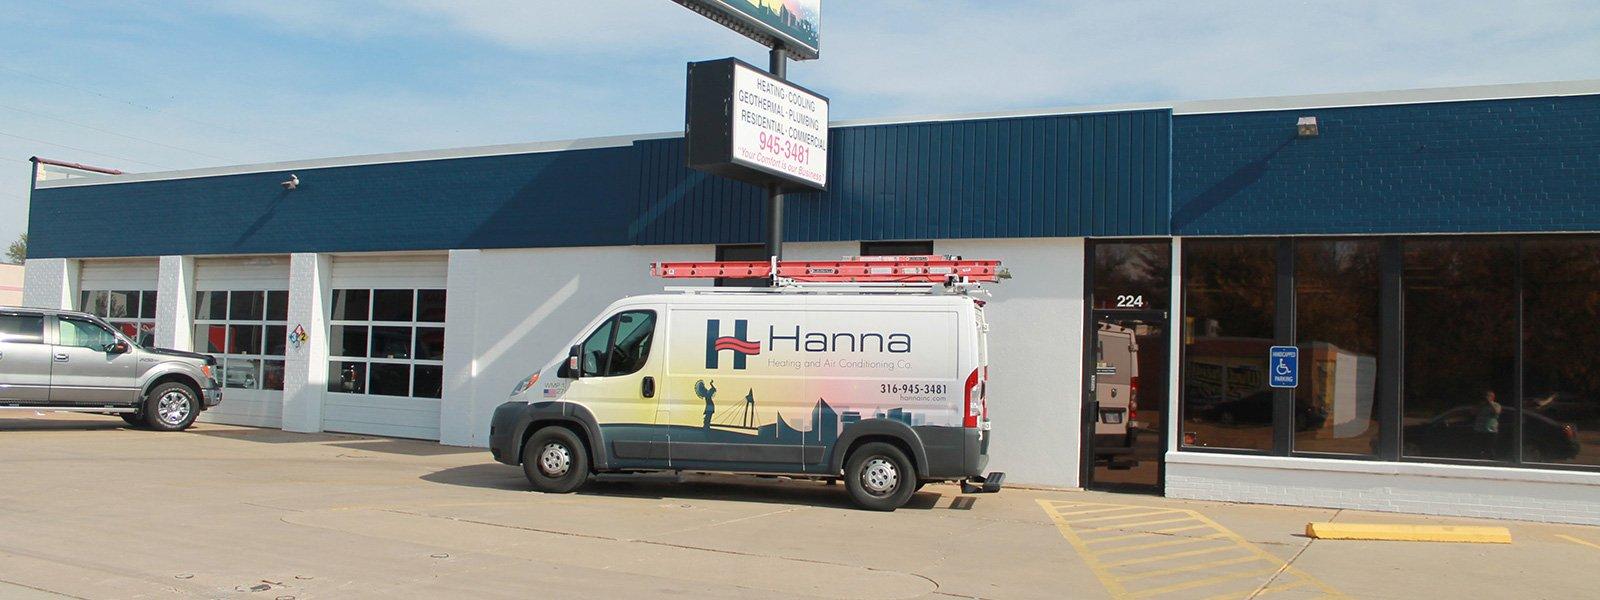 west wichita building2 - West Wichita